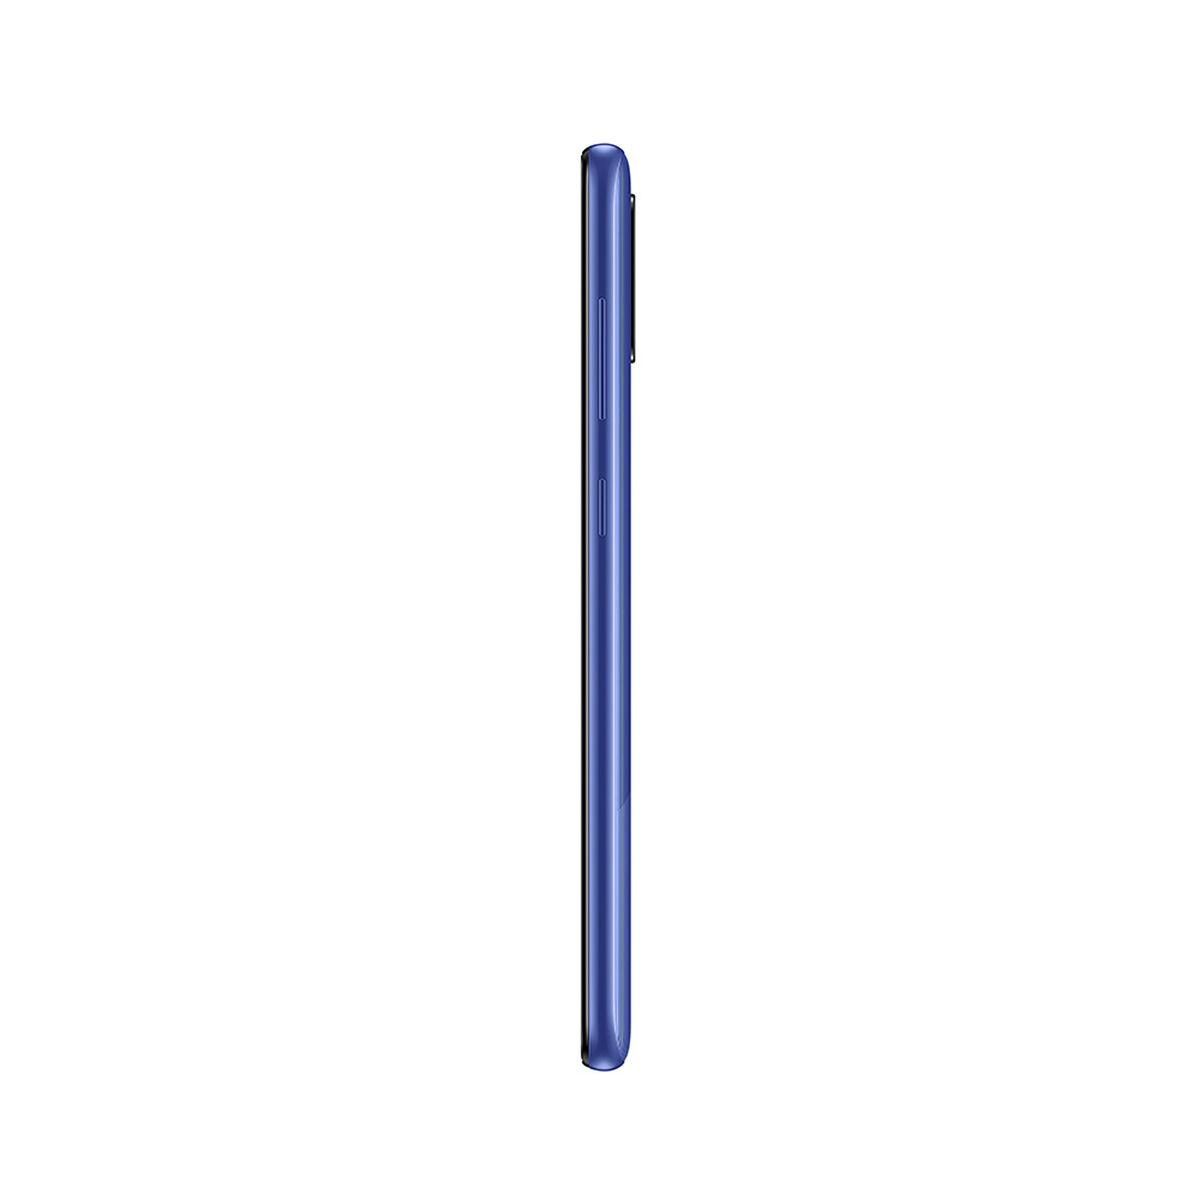 "Celular Samsung Galaxy A31 128GB 6,4"" Azul Liberado"